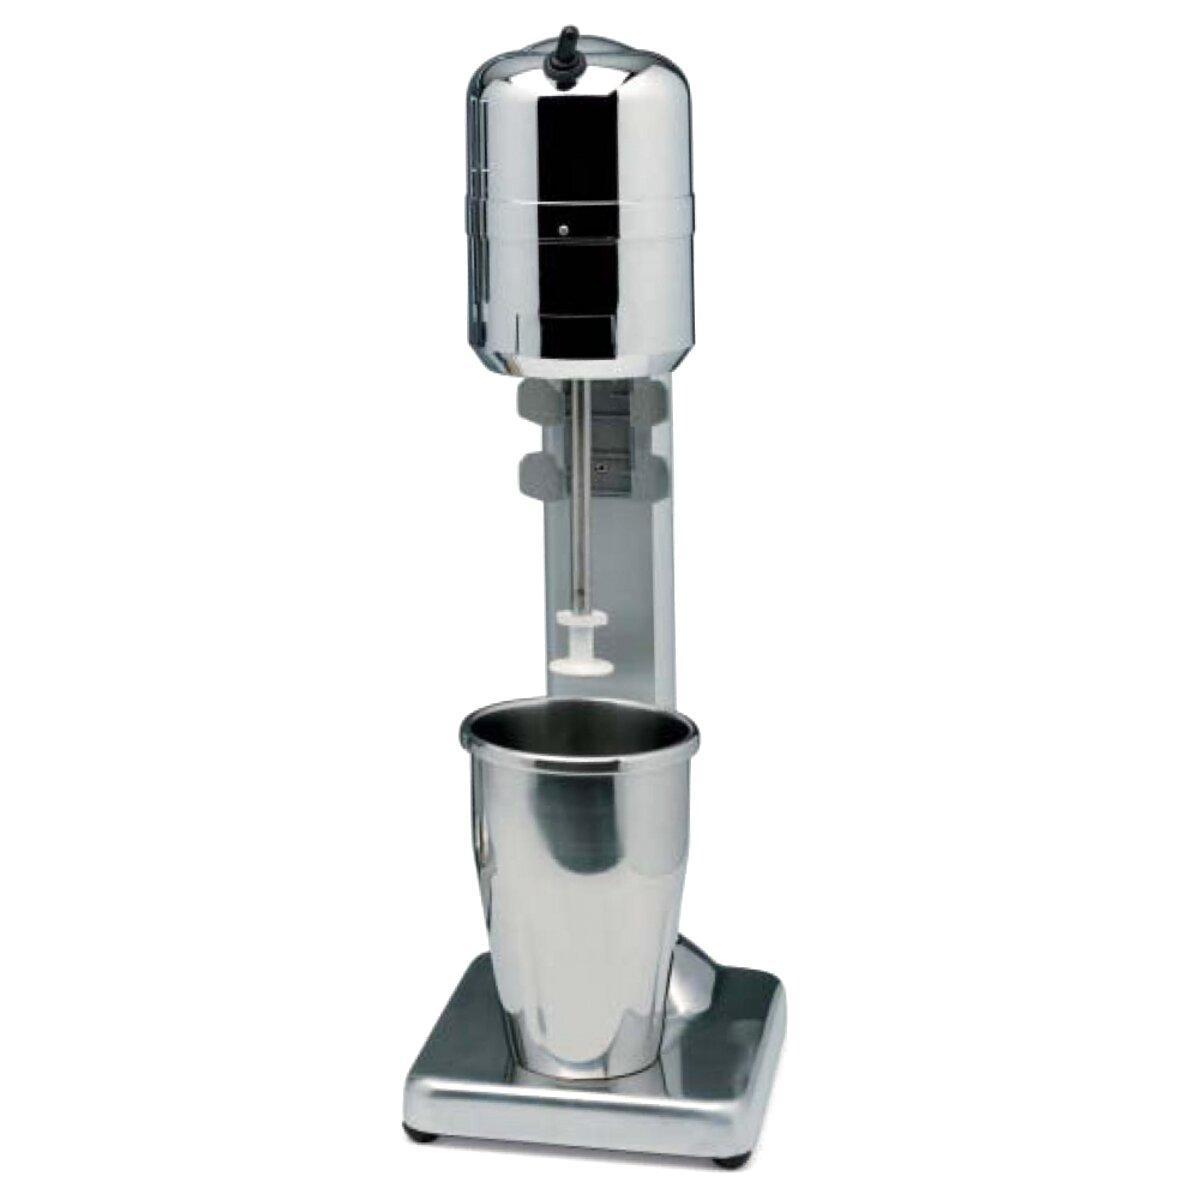 Mixer Bevande Frullino Frappe Bar Barista Frullatore Smoothie Maker Inox